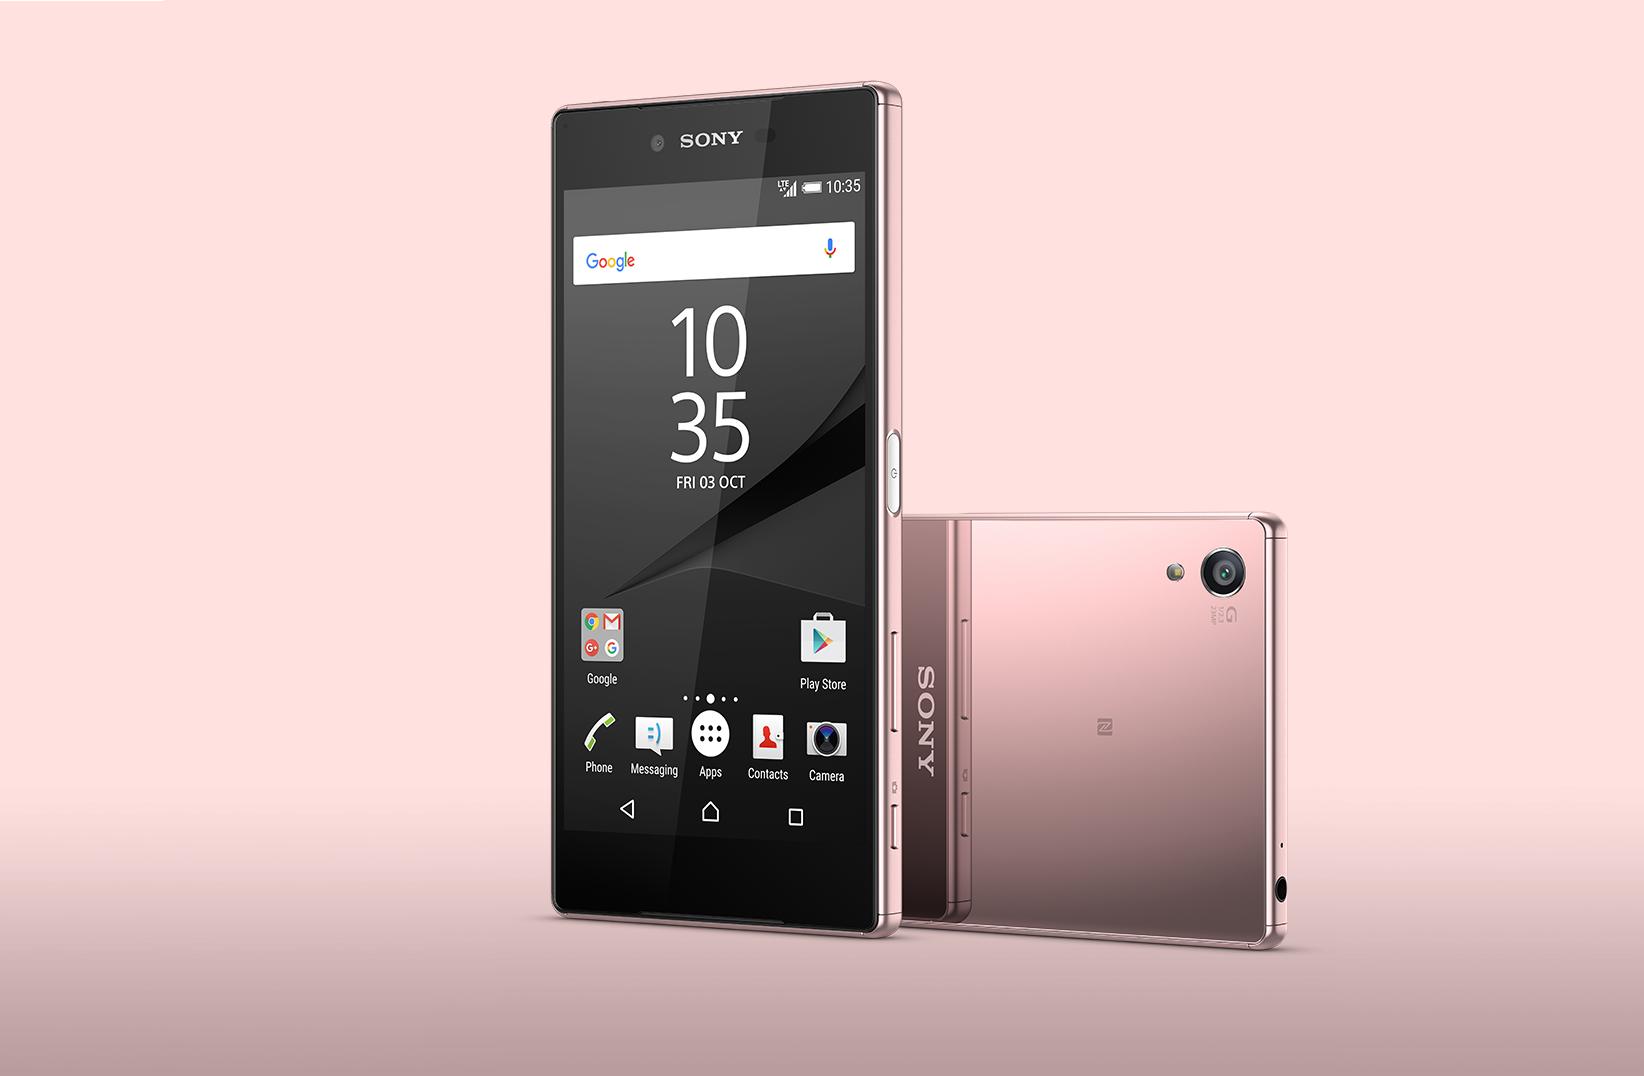 Sony Z5 Premium 粉色鏡面款登場,SmartWatch 3 中文版上線